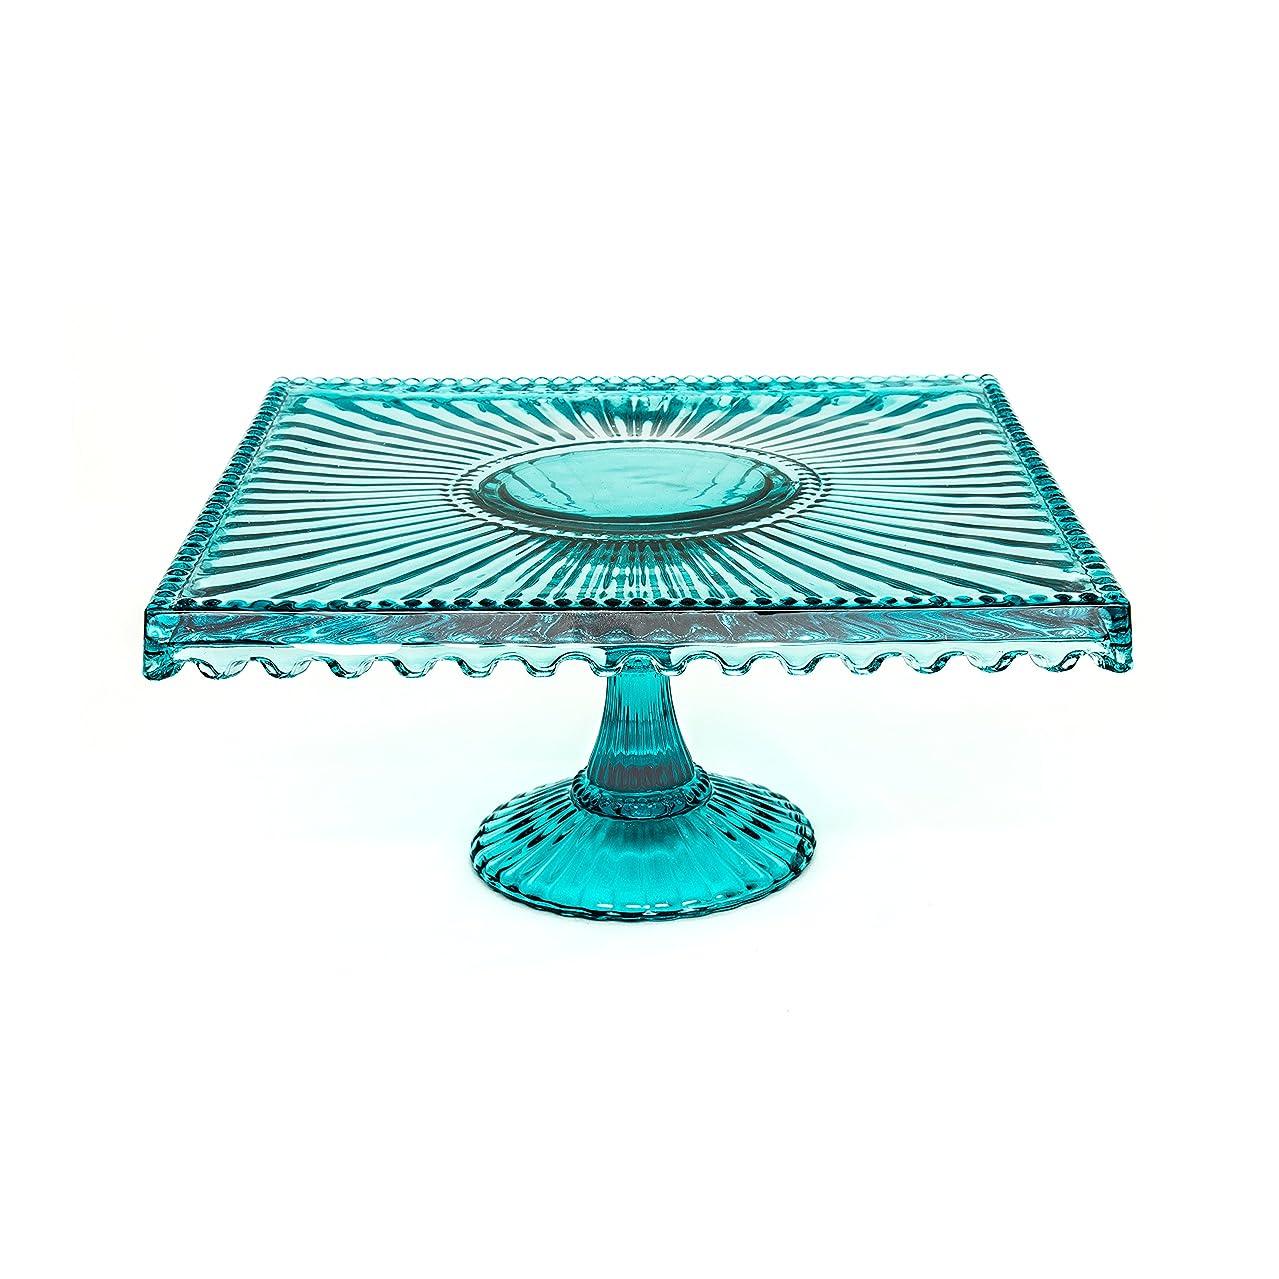 Alexandra Glass Square 10 inch Cake Stand - Blue